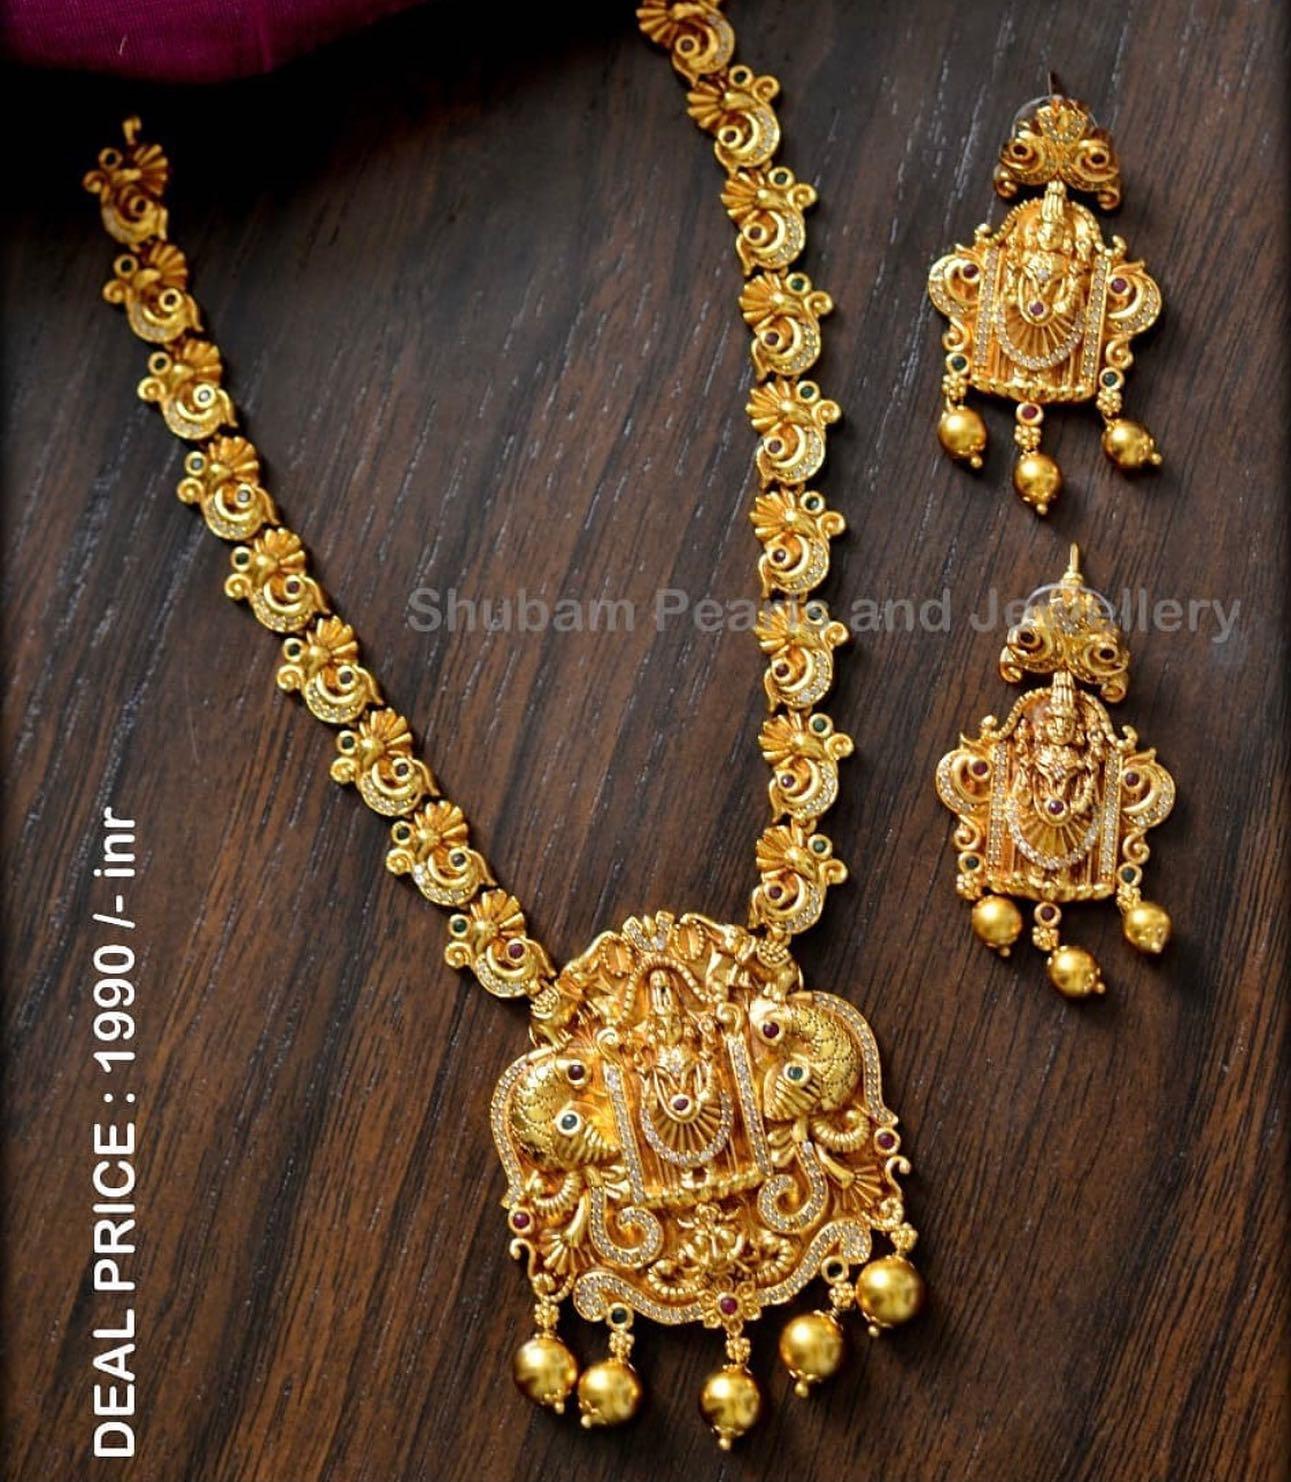 Beautiful one gram gold long haaram with Lakshmi devi pendant. 1 gram gold antique jewellery one gram gold cz jewellery with price 1 gram gold bridal jewellery set